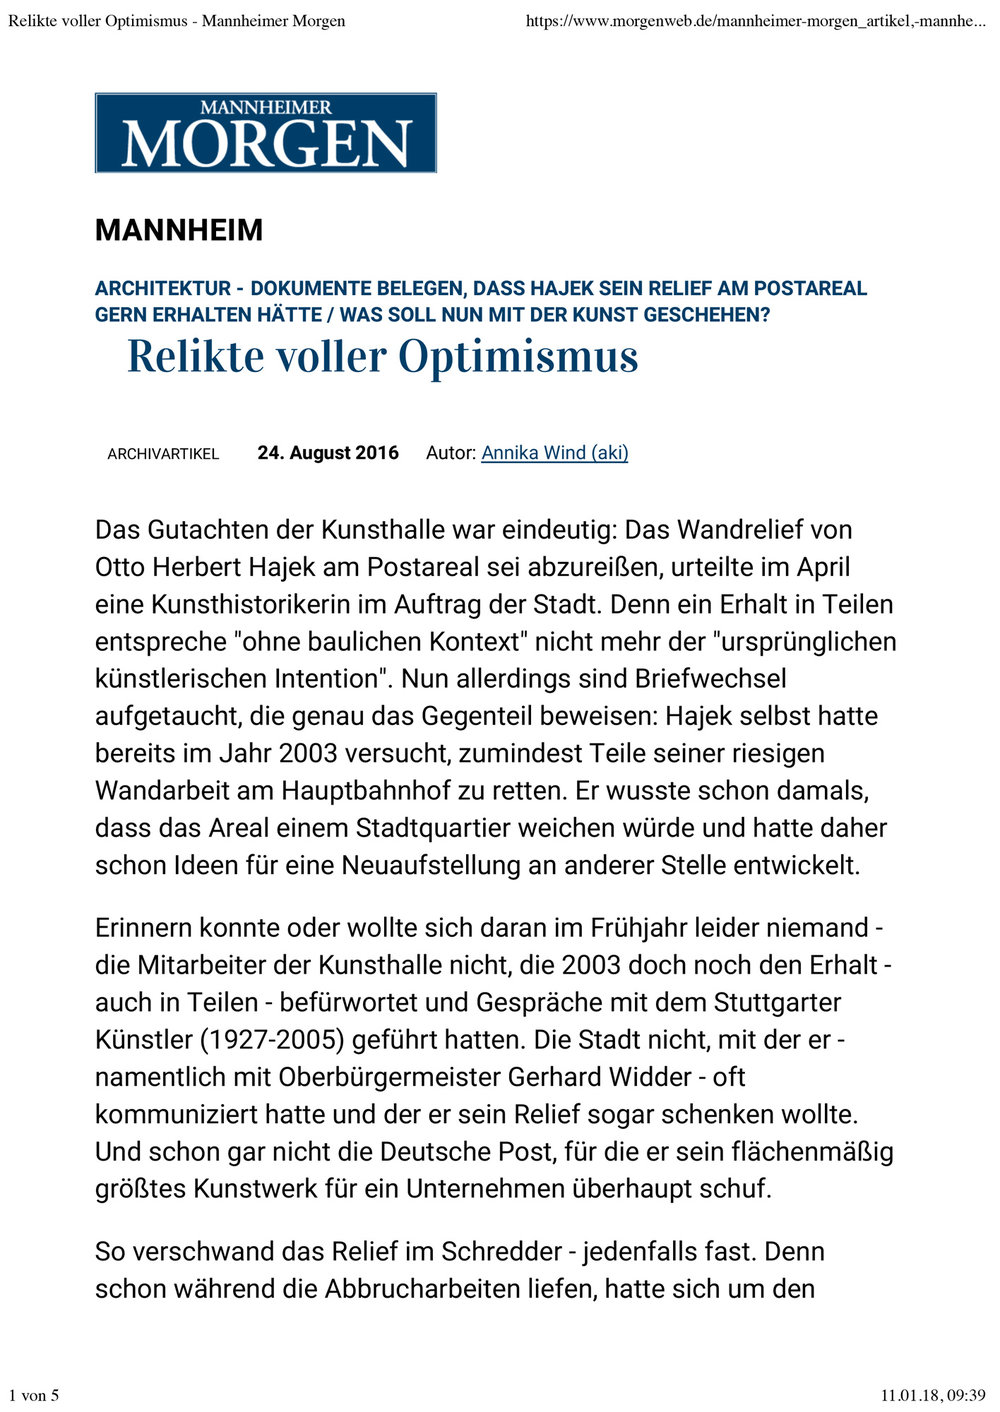 Relikte-voller-Optimismus---Mannheimer-Morgen-1.jpg